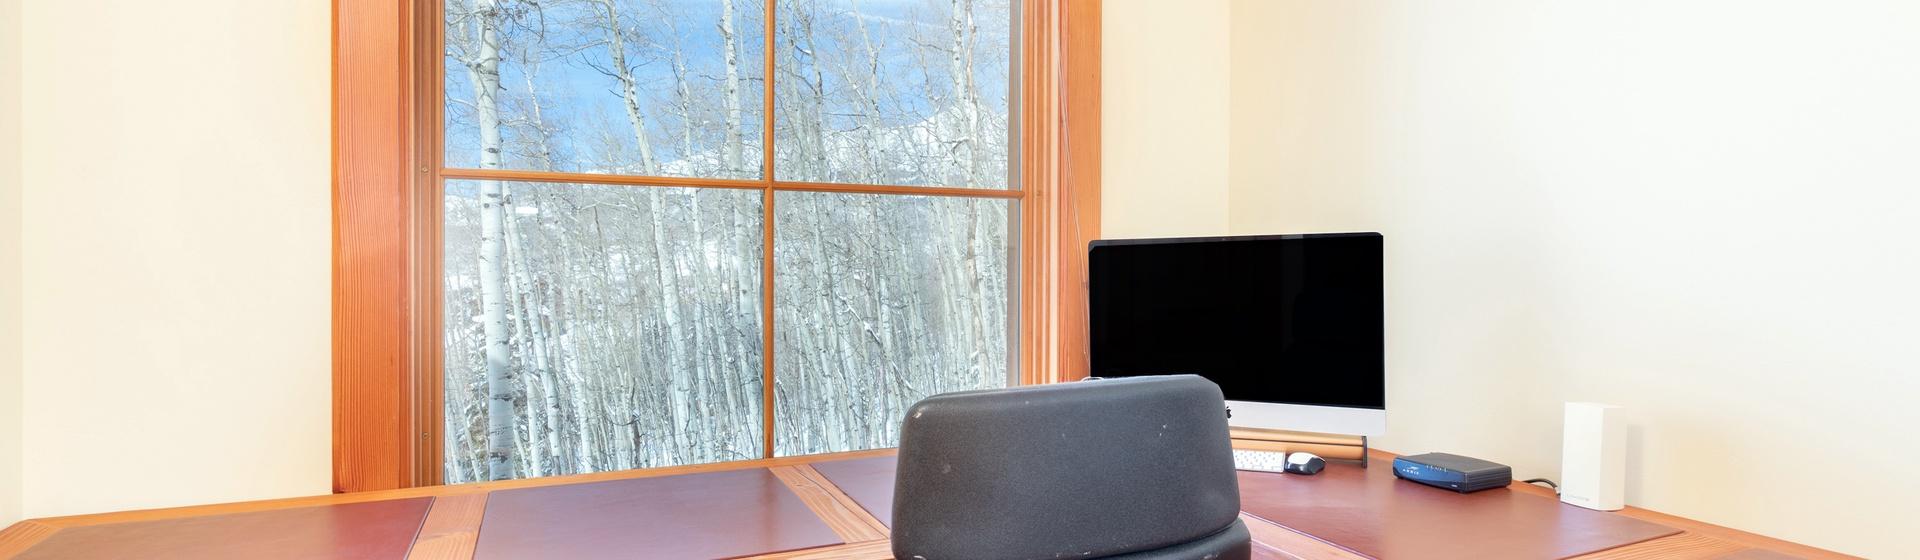 32-MountainVillage-Positive-Outlook-Office-Web.jpg